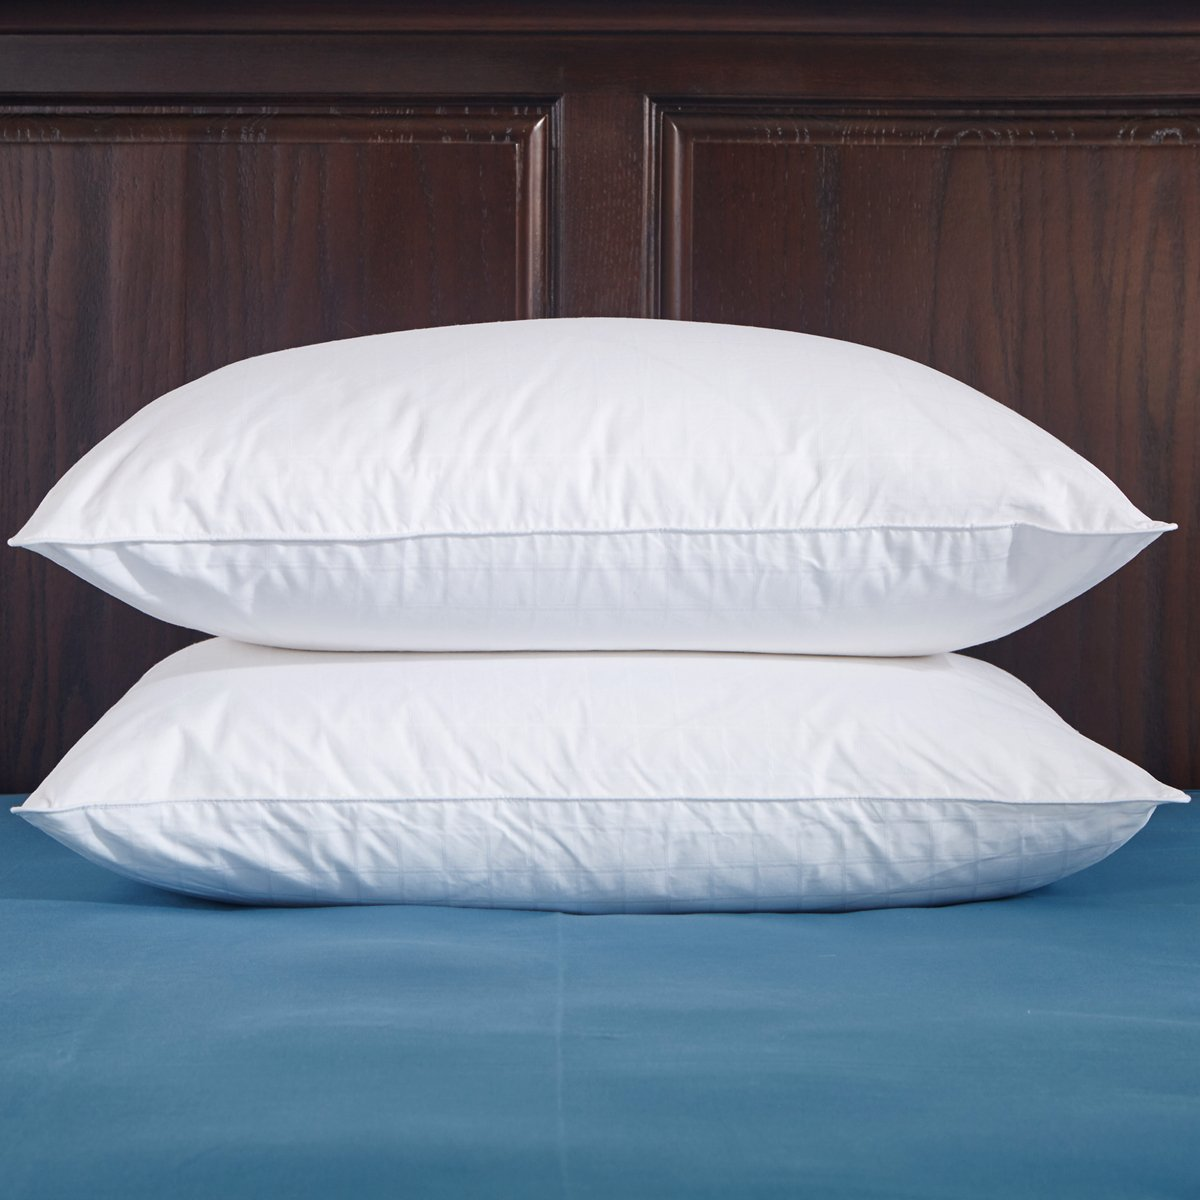 Puredown 75% White Down Pillows, 600 Filling Power, Cotton Cover, 2 Set, King Size